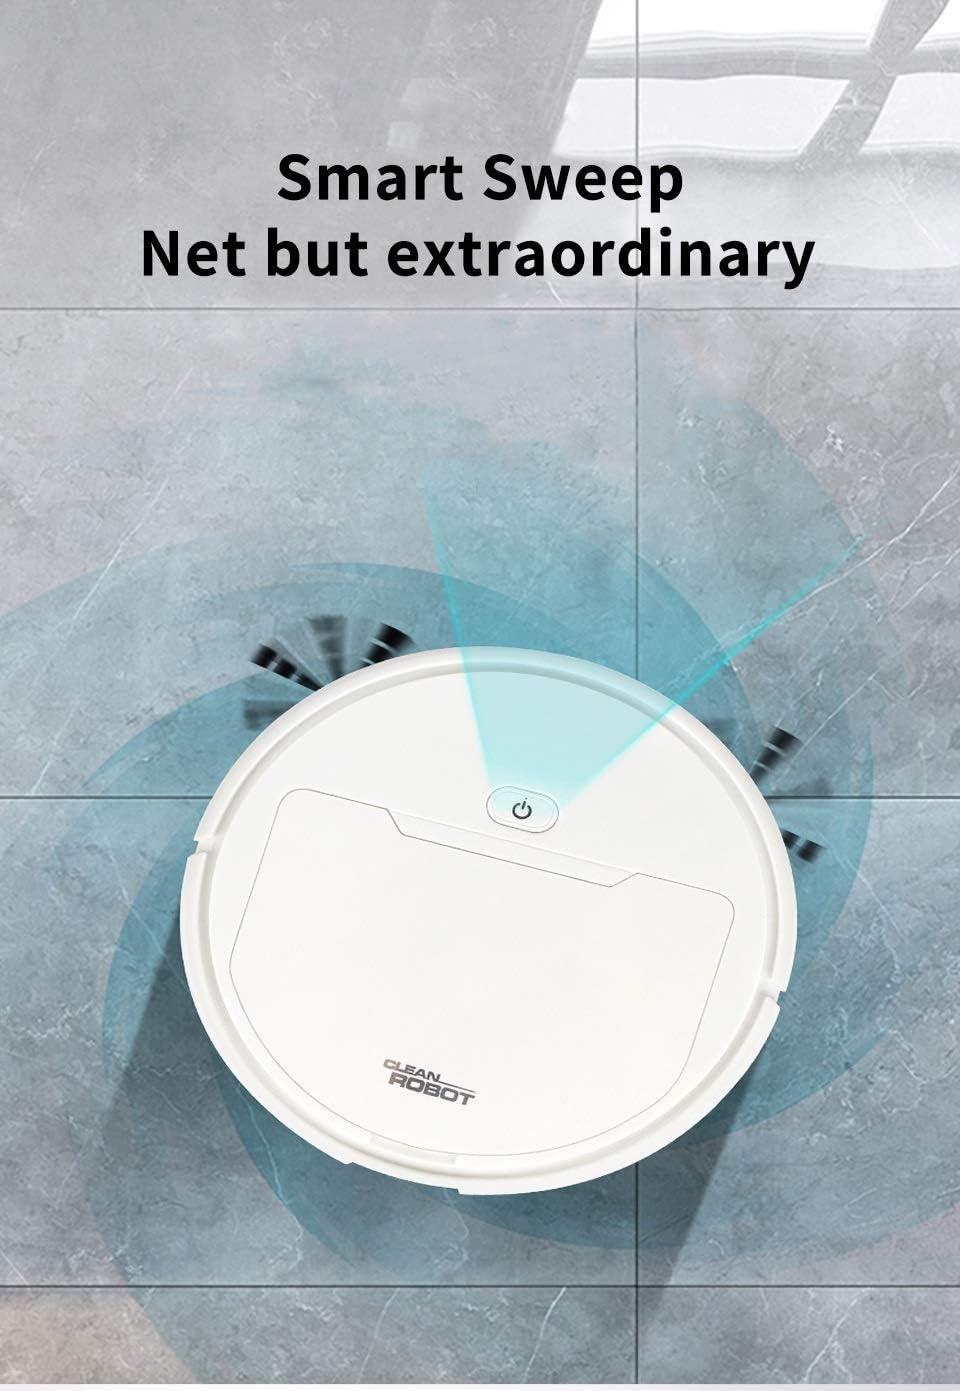 XXFFD Smart Home Robot Aspirateur Balai Balayer Cleaner Humide Sec Petit Rechargeable Balayer Nettoyage Automatique Accueil Robot Machine (Color : Black) White